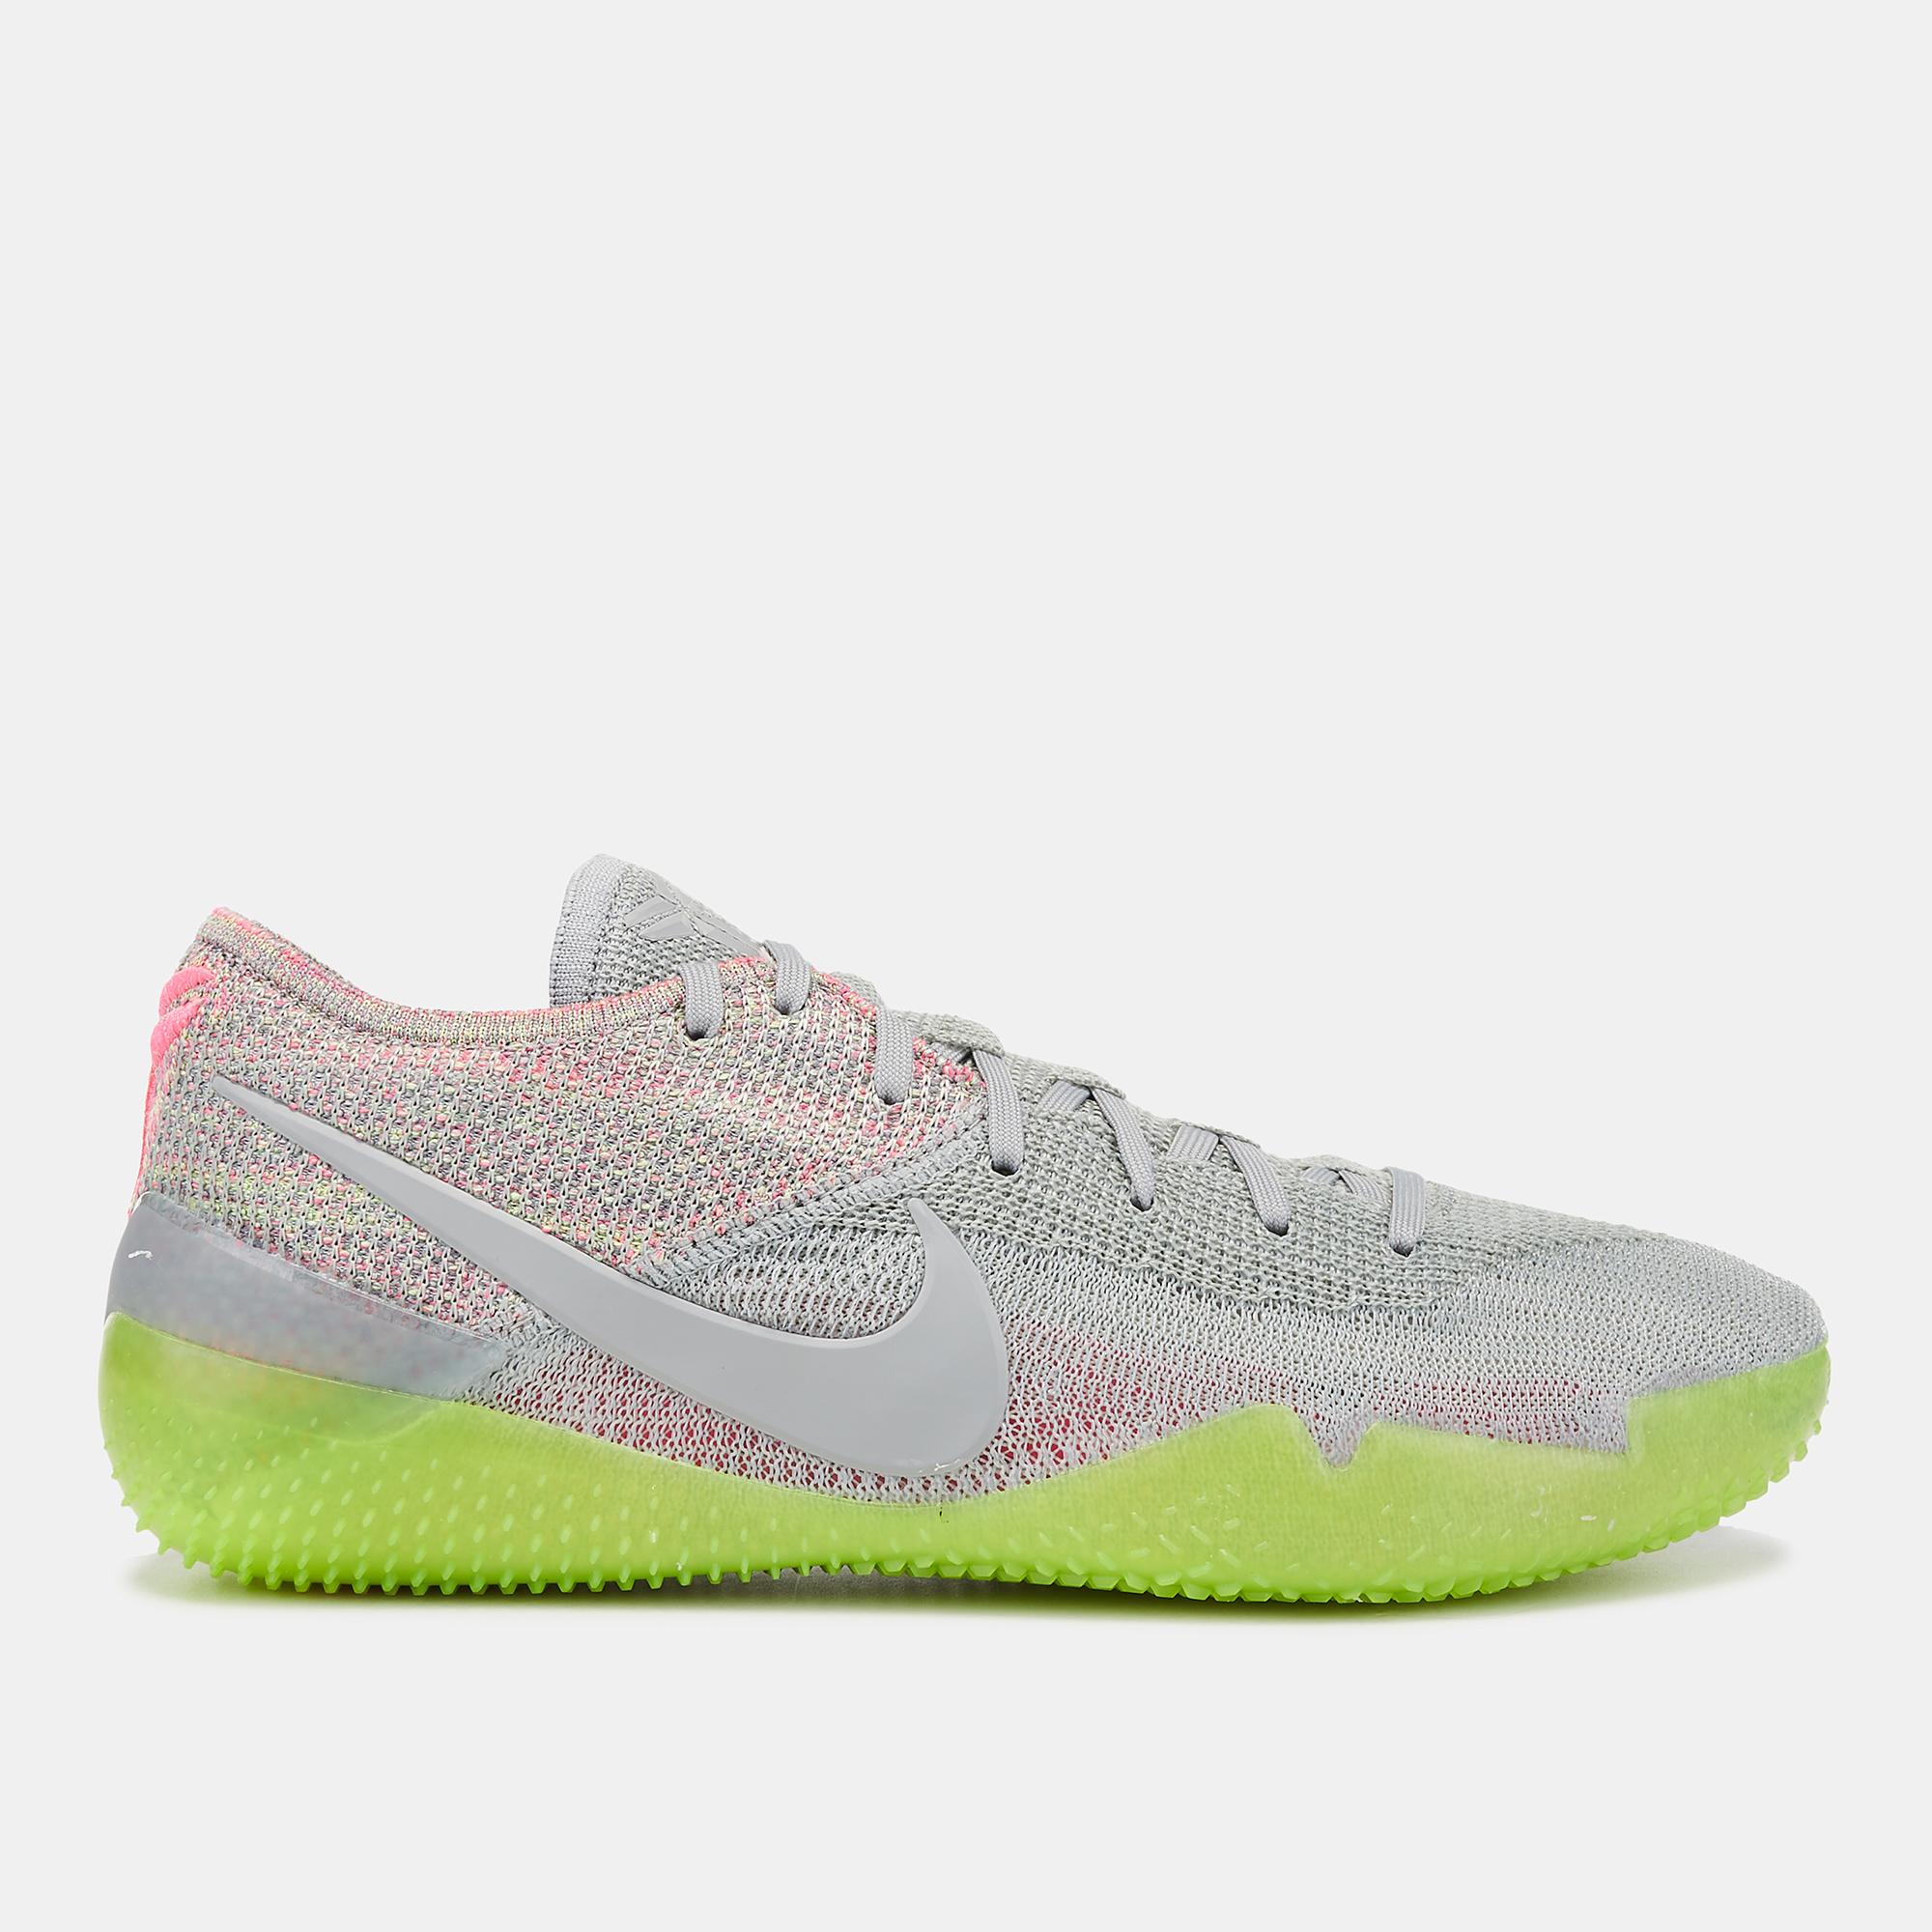 d226e32868d Nike Kobe AD NXT 360 Shoe